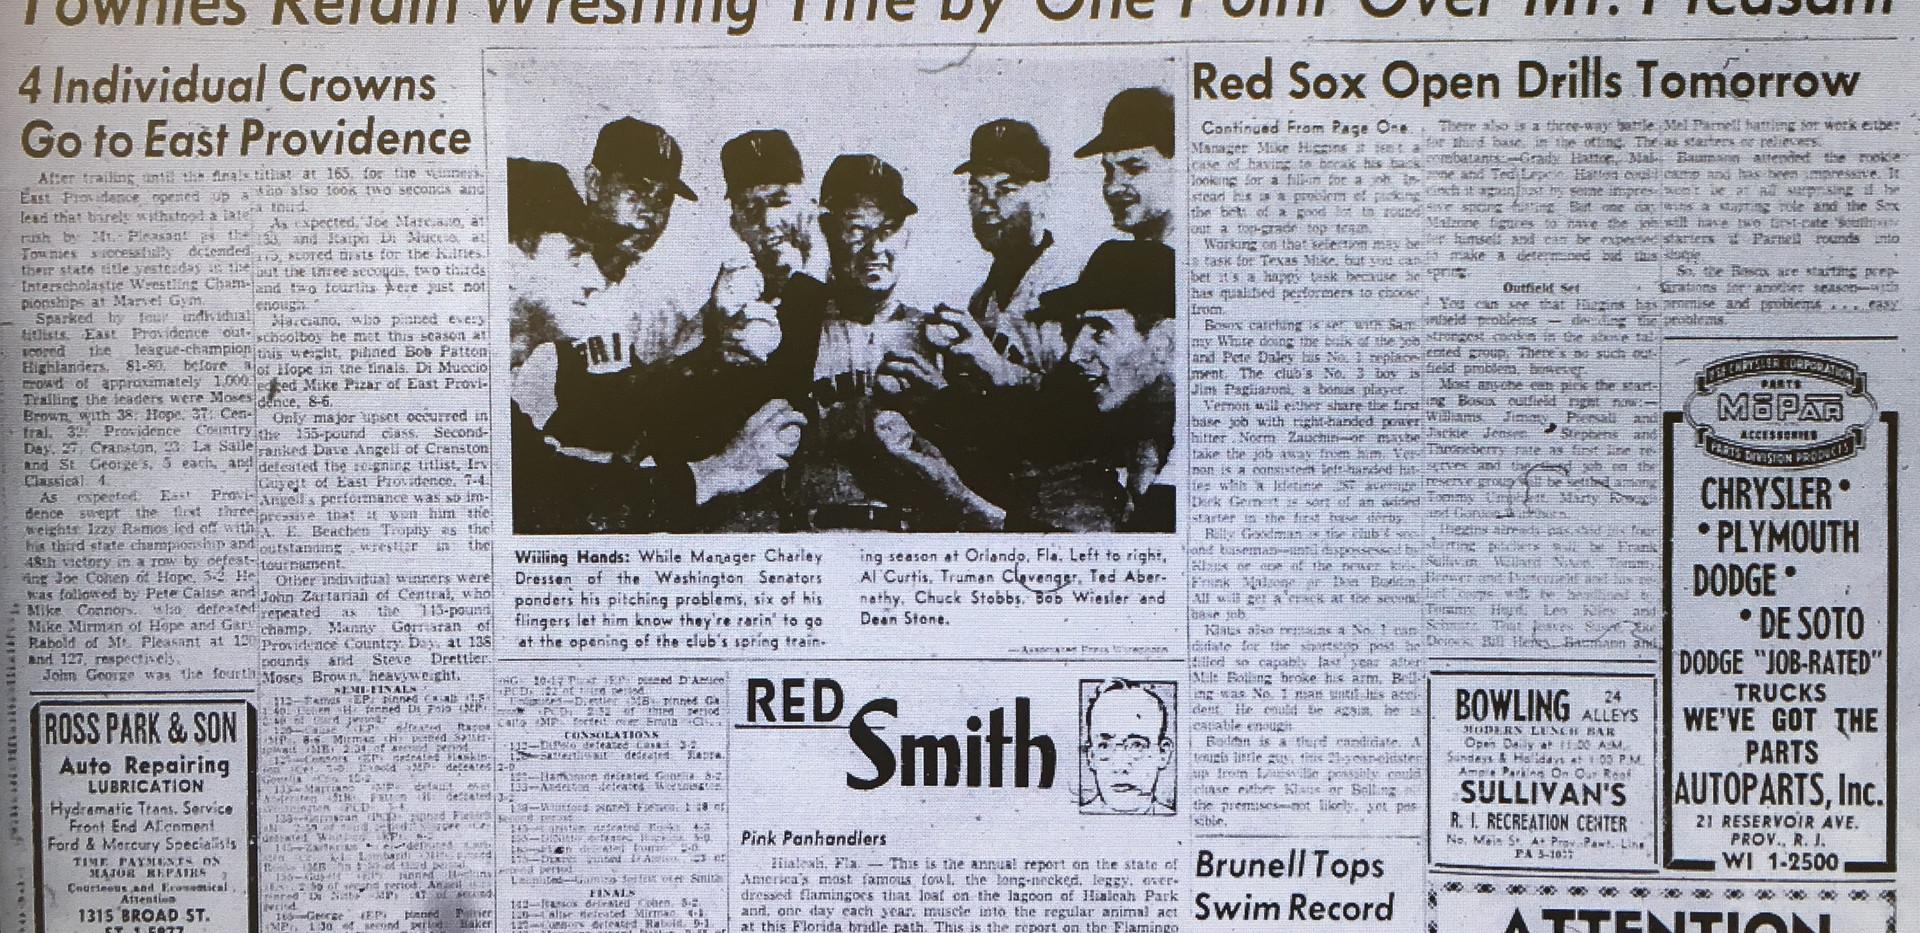 1956 State Tournament